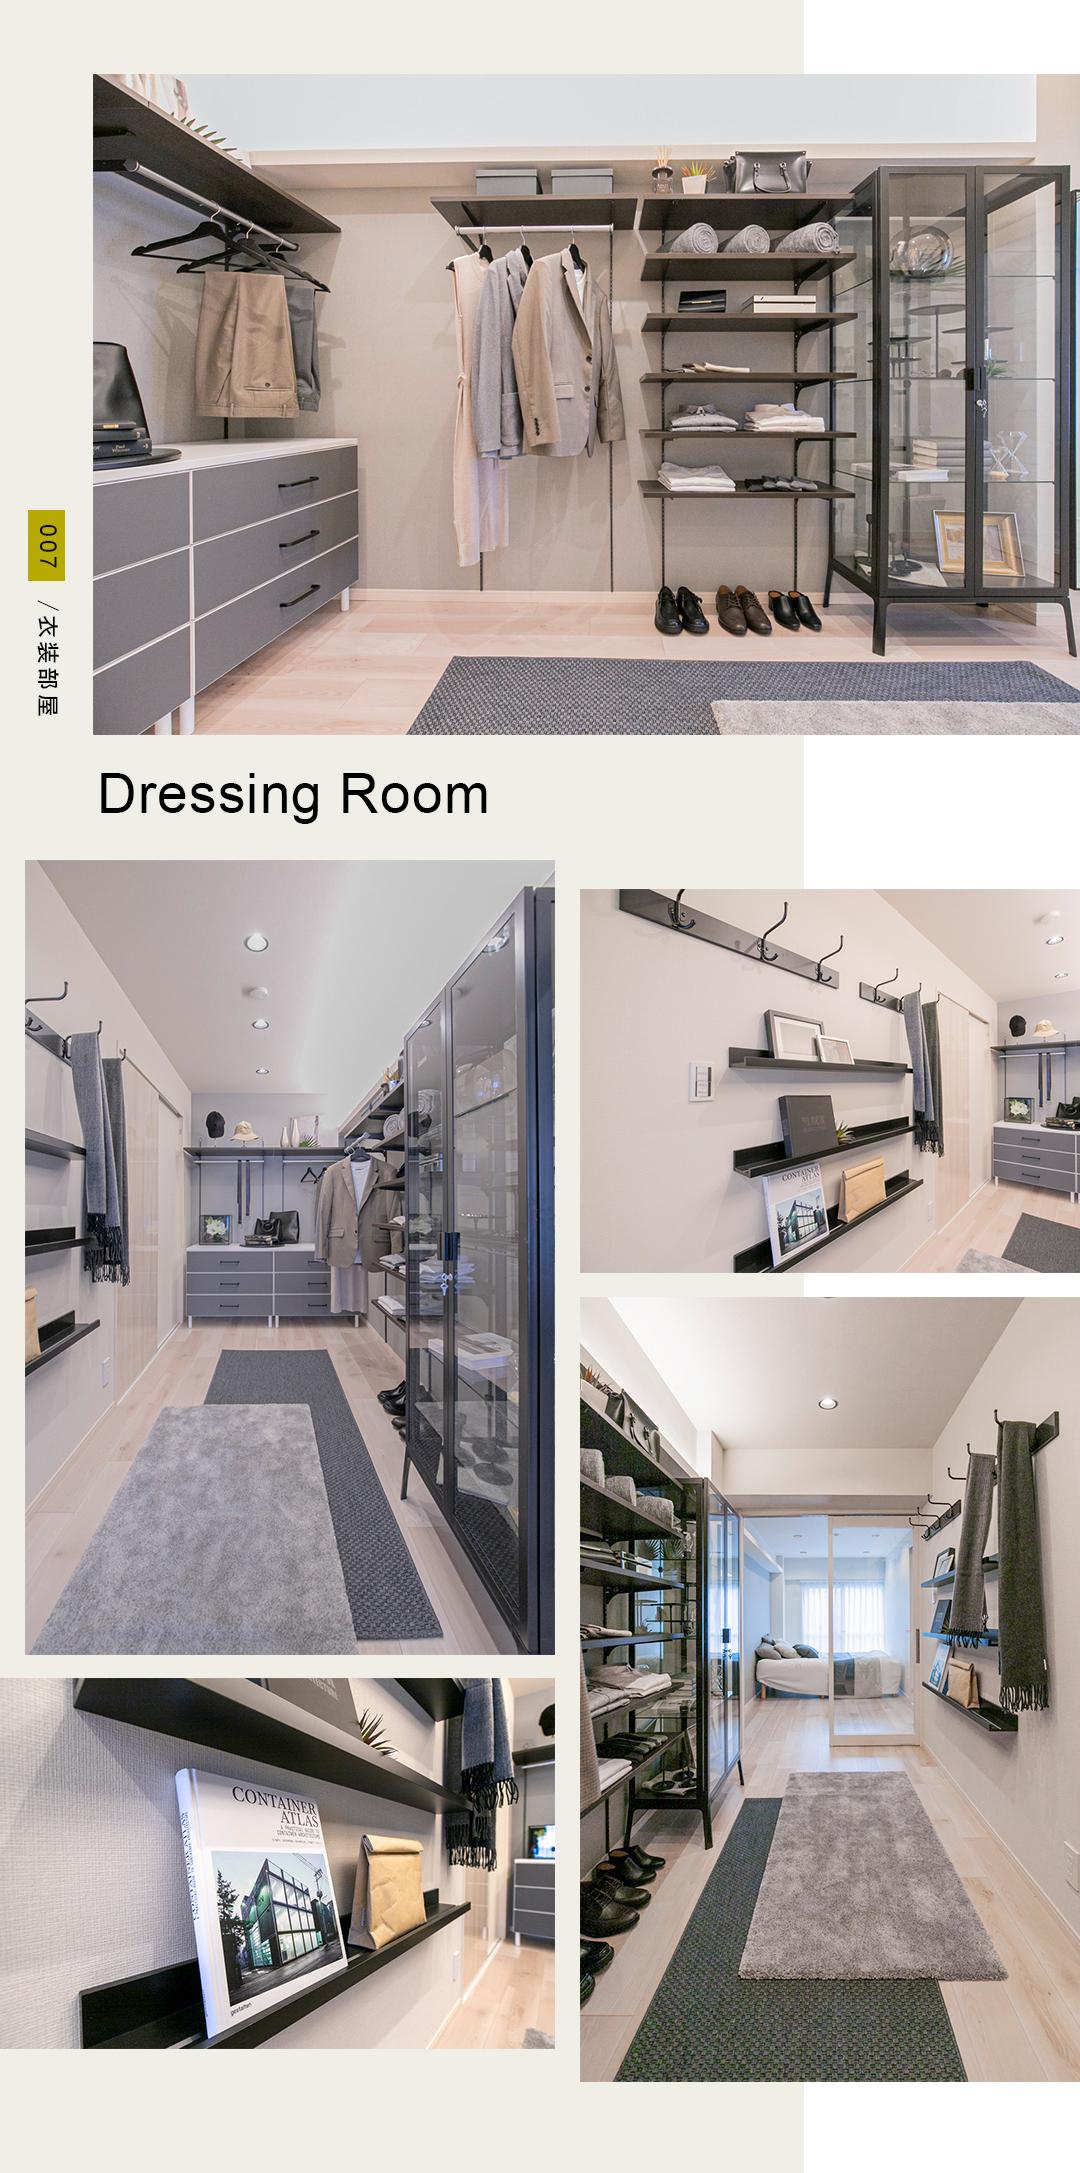 007,dressingroom,衣装部屋,,